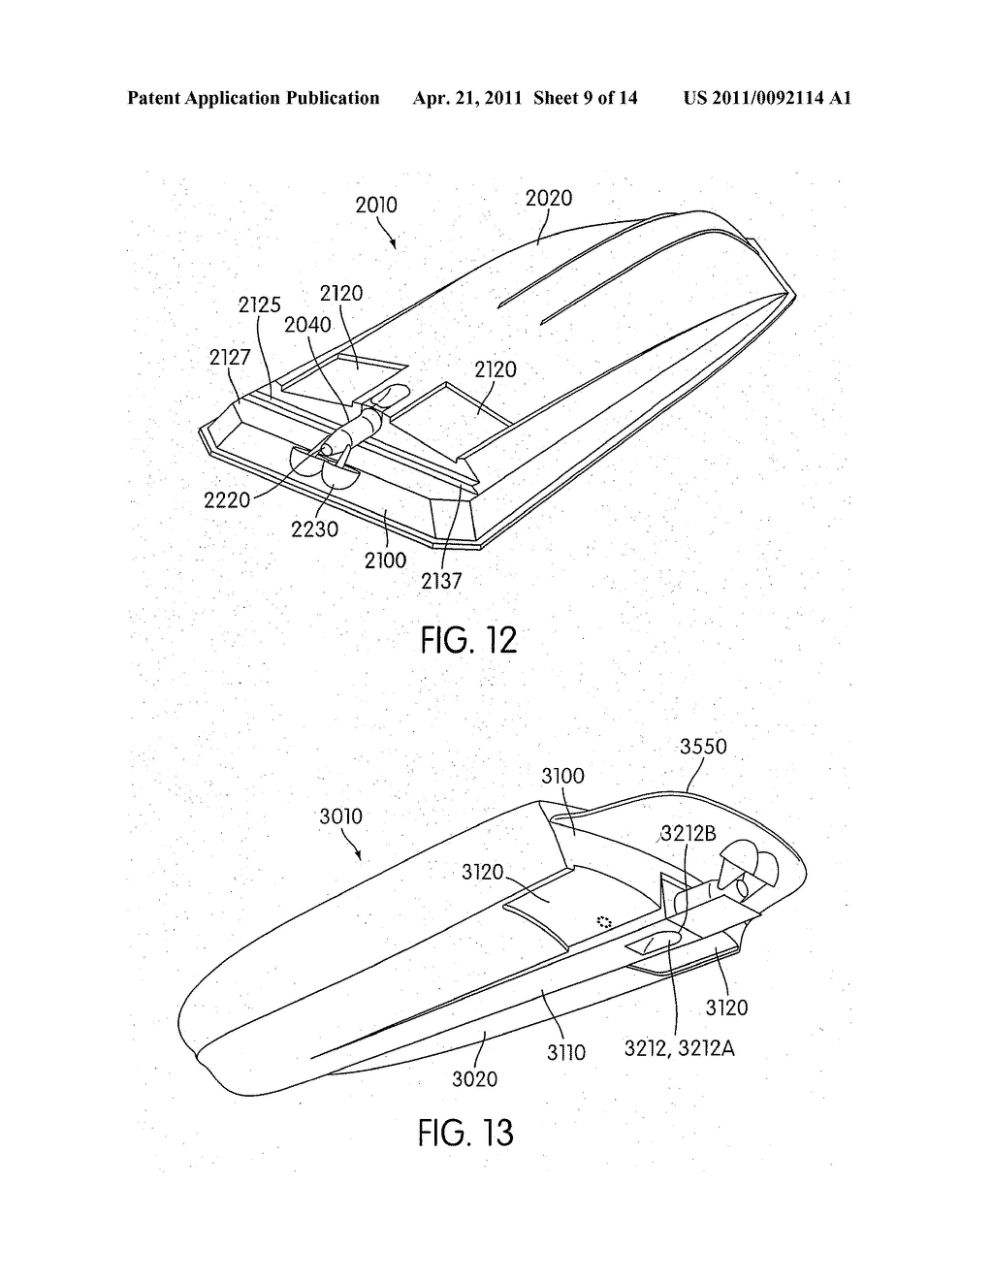 Diagram Yamaha Jet Boat Wiring Diagram Full Version Hd Quality Wiring Diagram Diagramsbaty Fattoriagarbole It